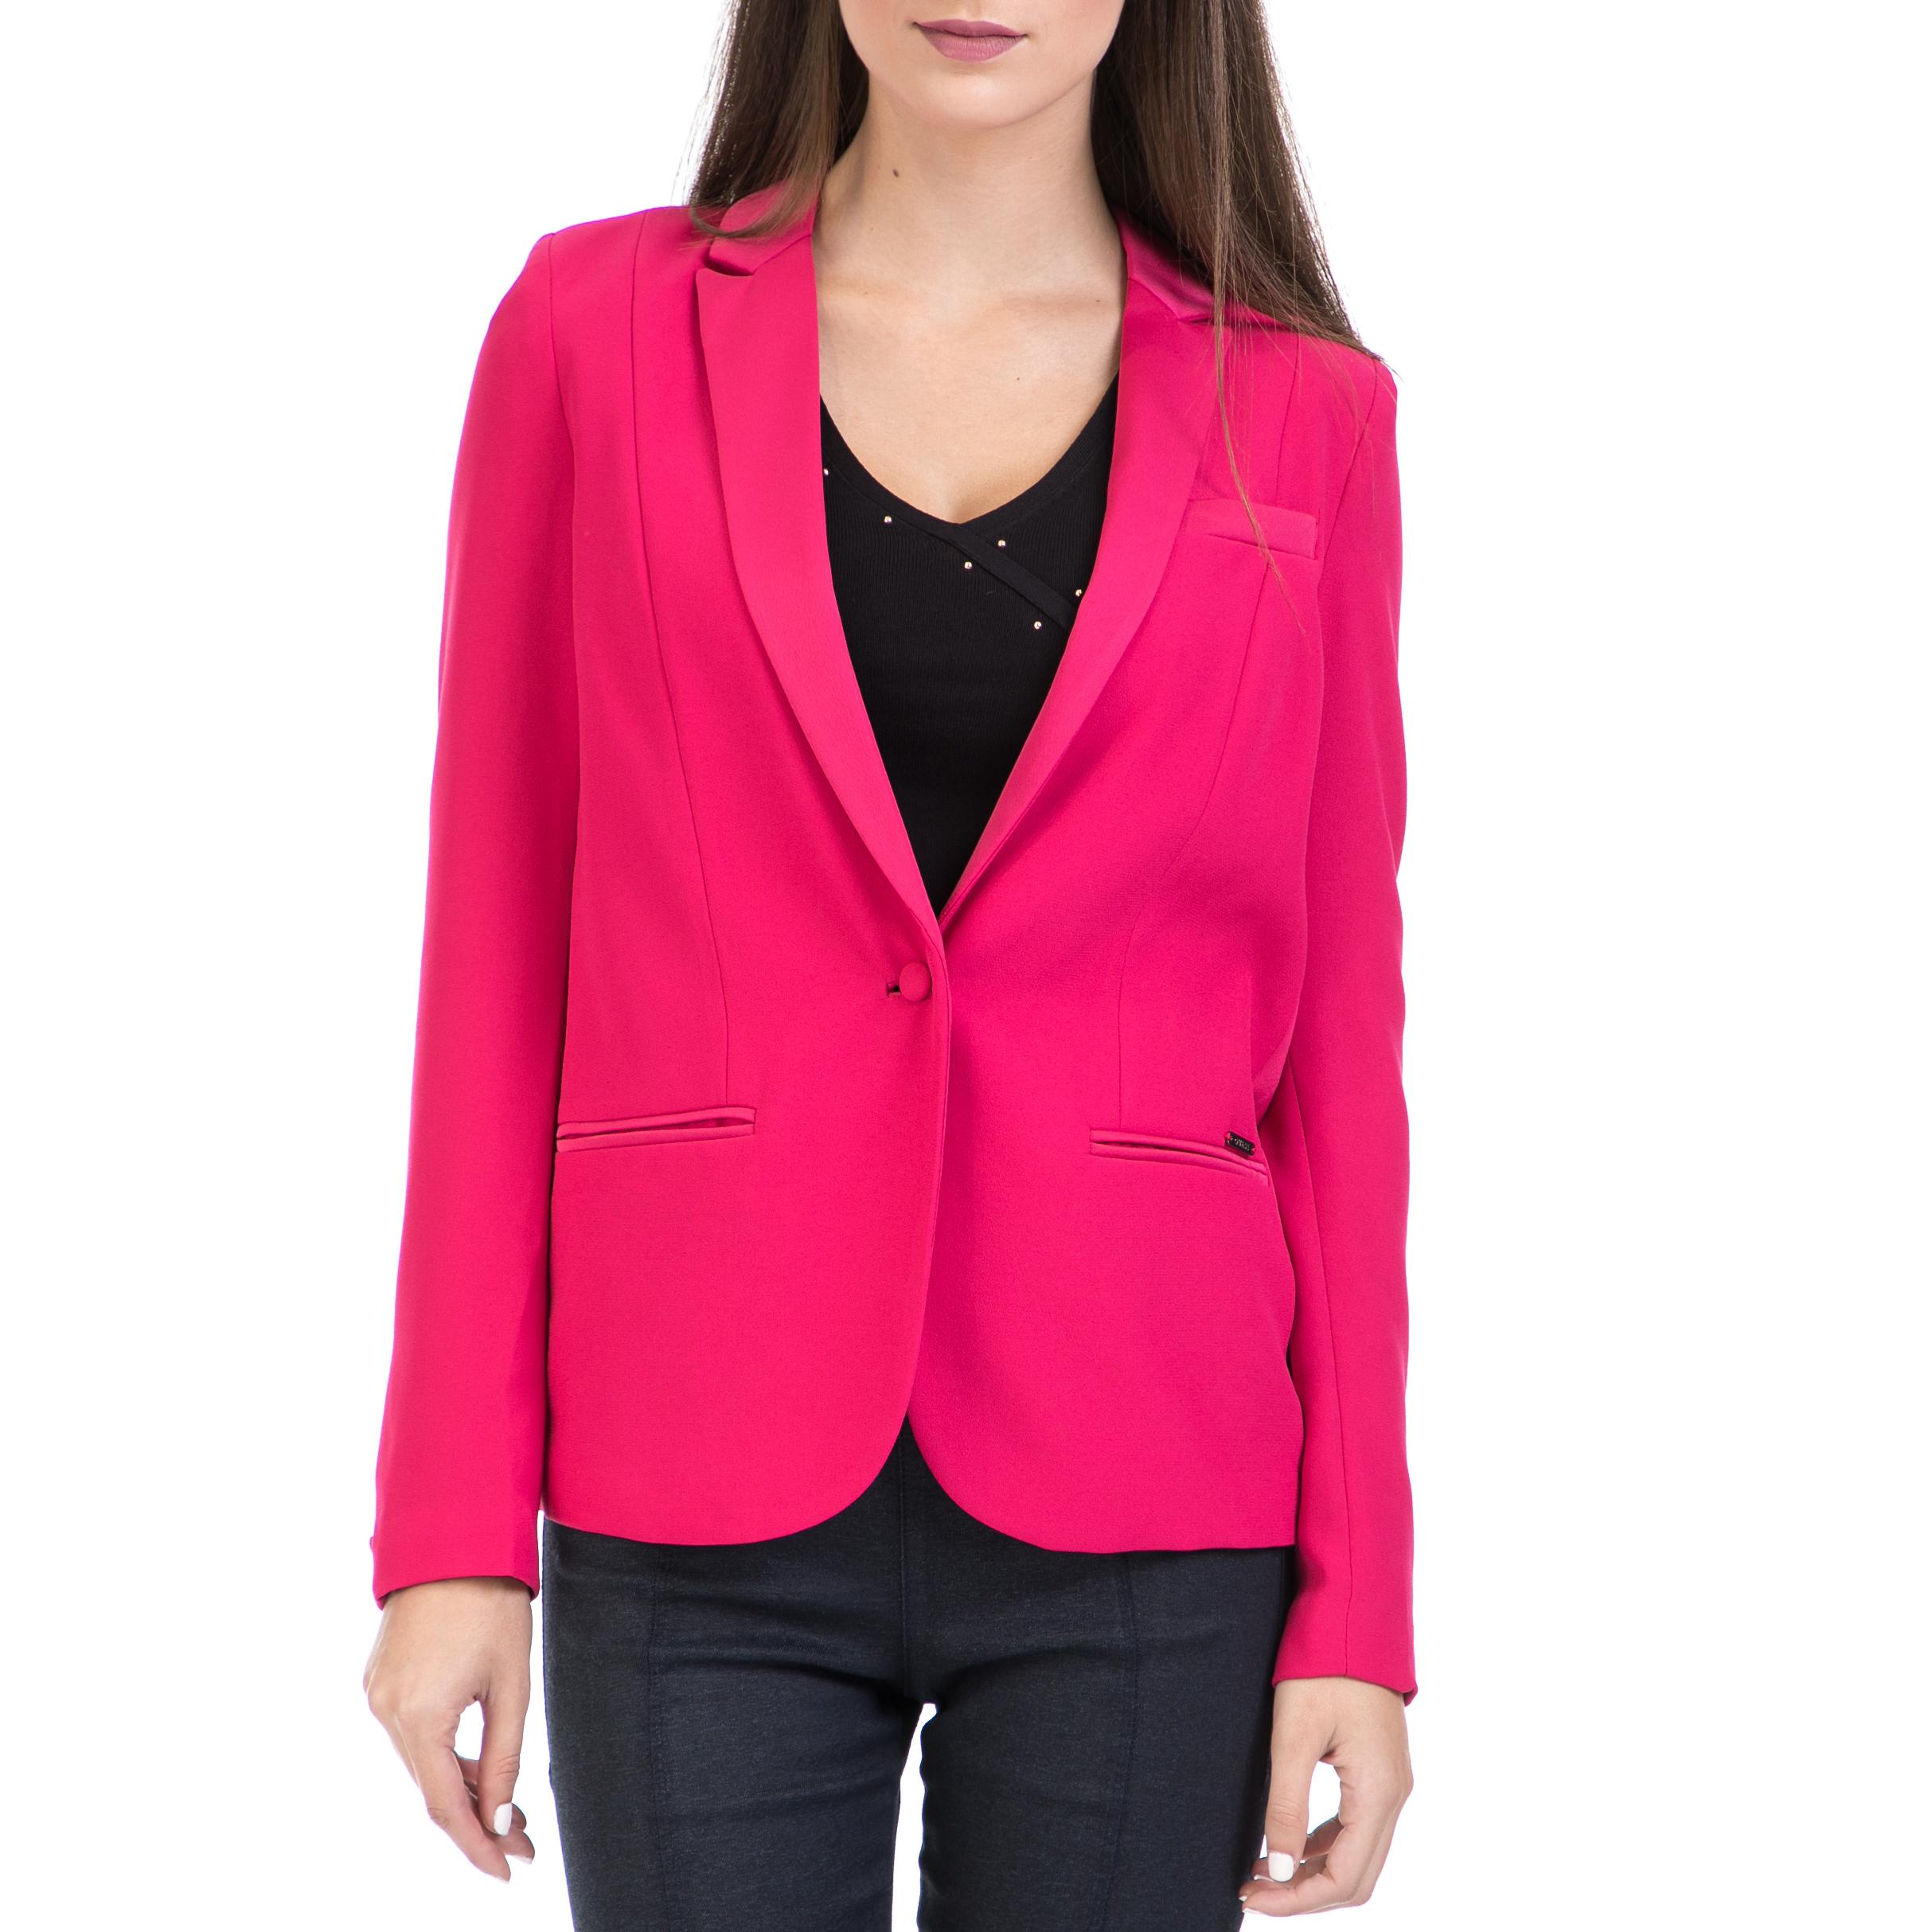 GUESS - Γυναικείο σακάκι GUESS ροζ γυναικεία ρούχα πανωφόρια σακάκια